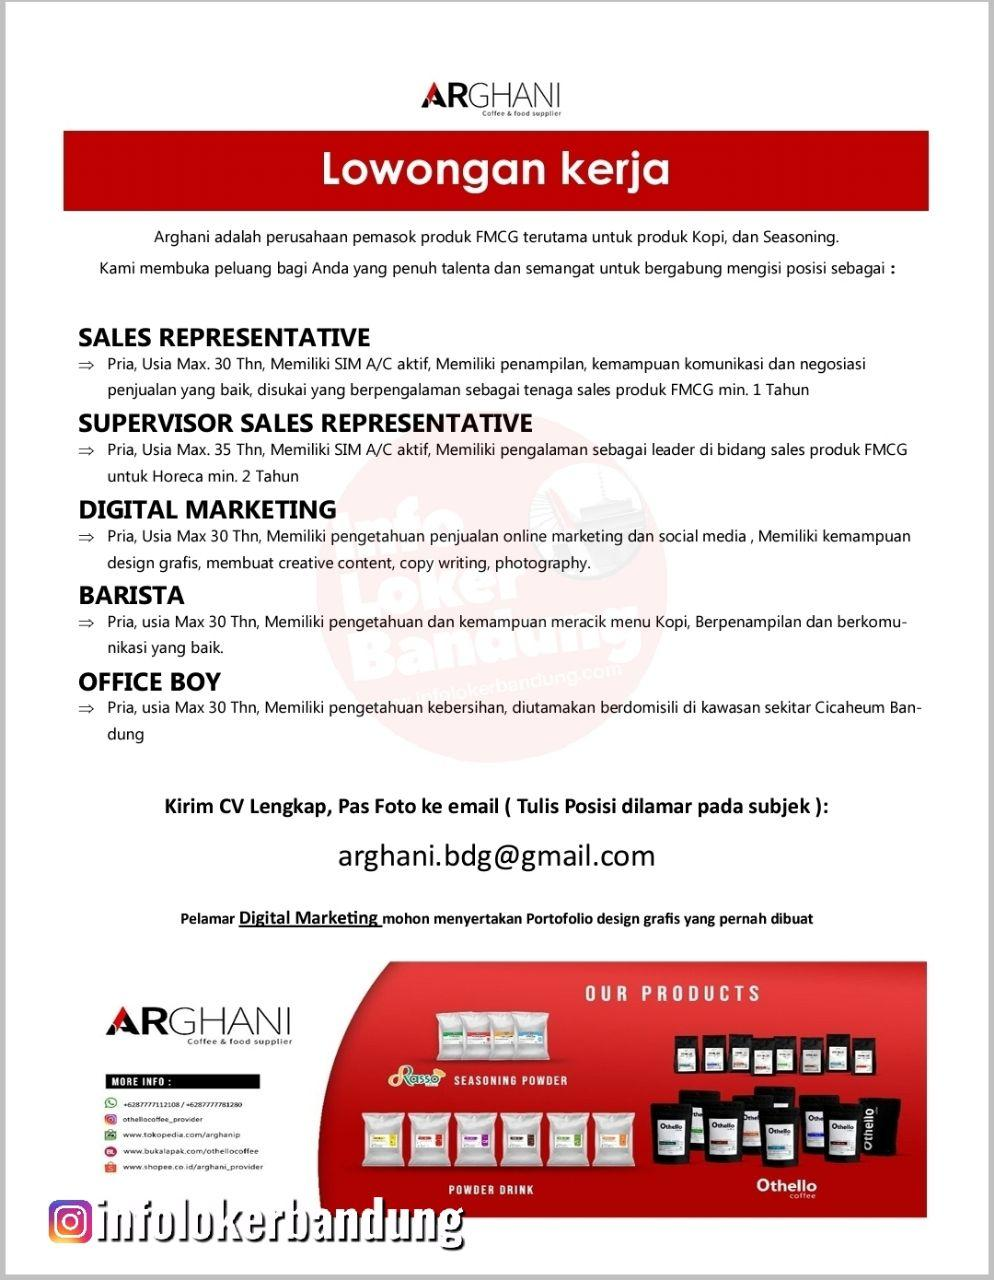 Lowongan Kerja Arghani Bandung Februari 2020